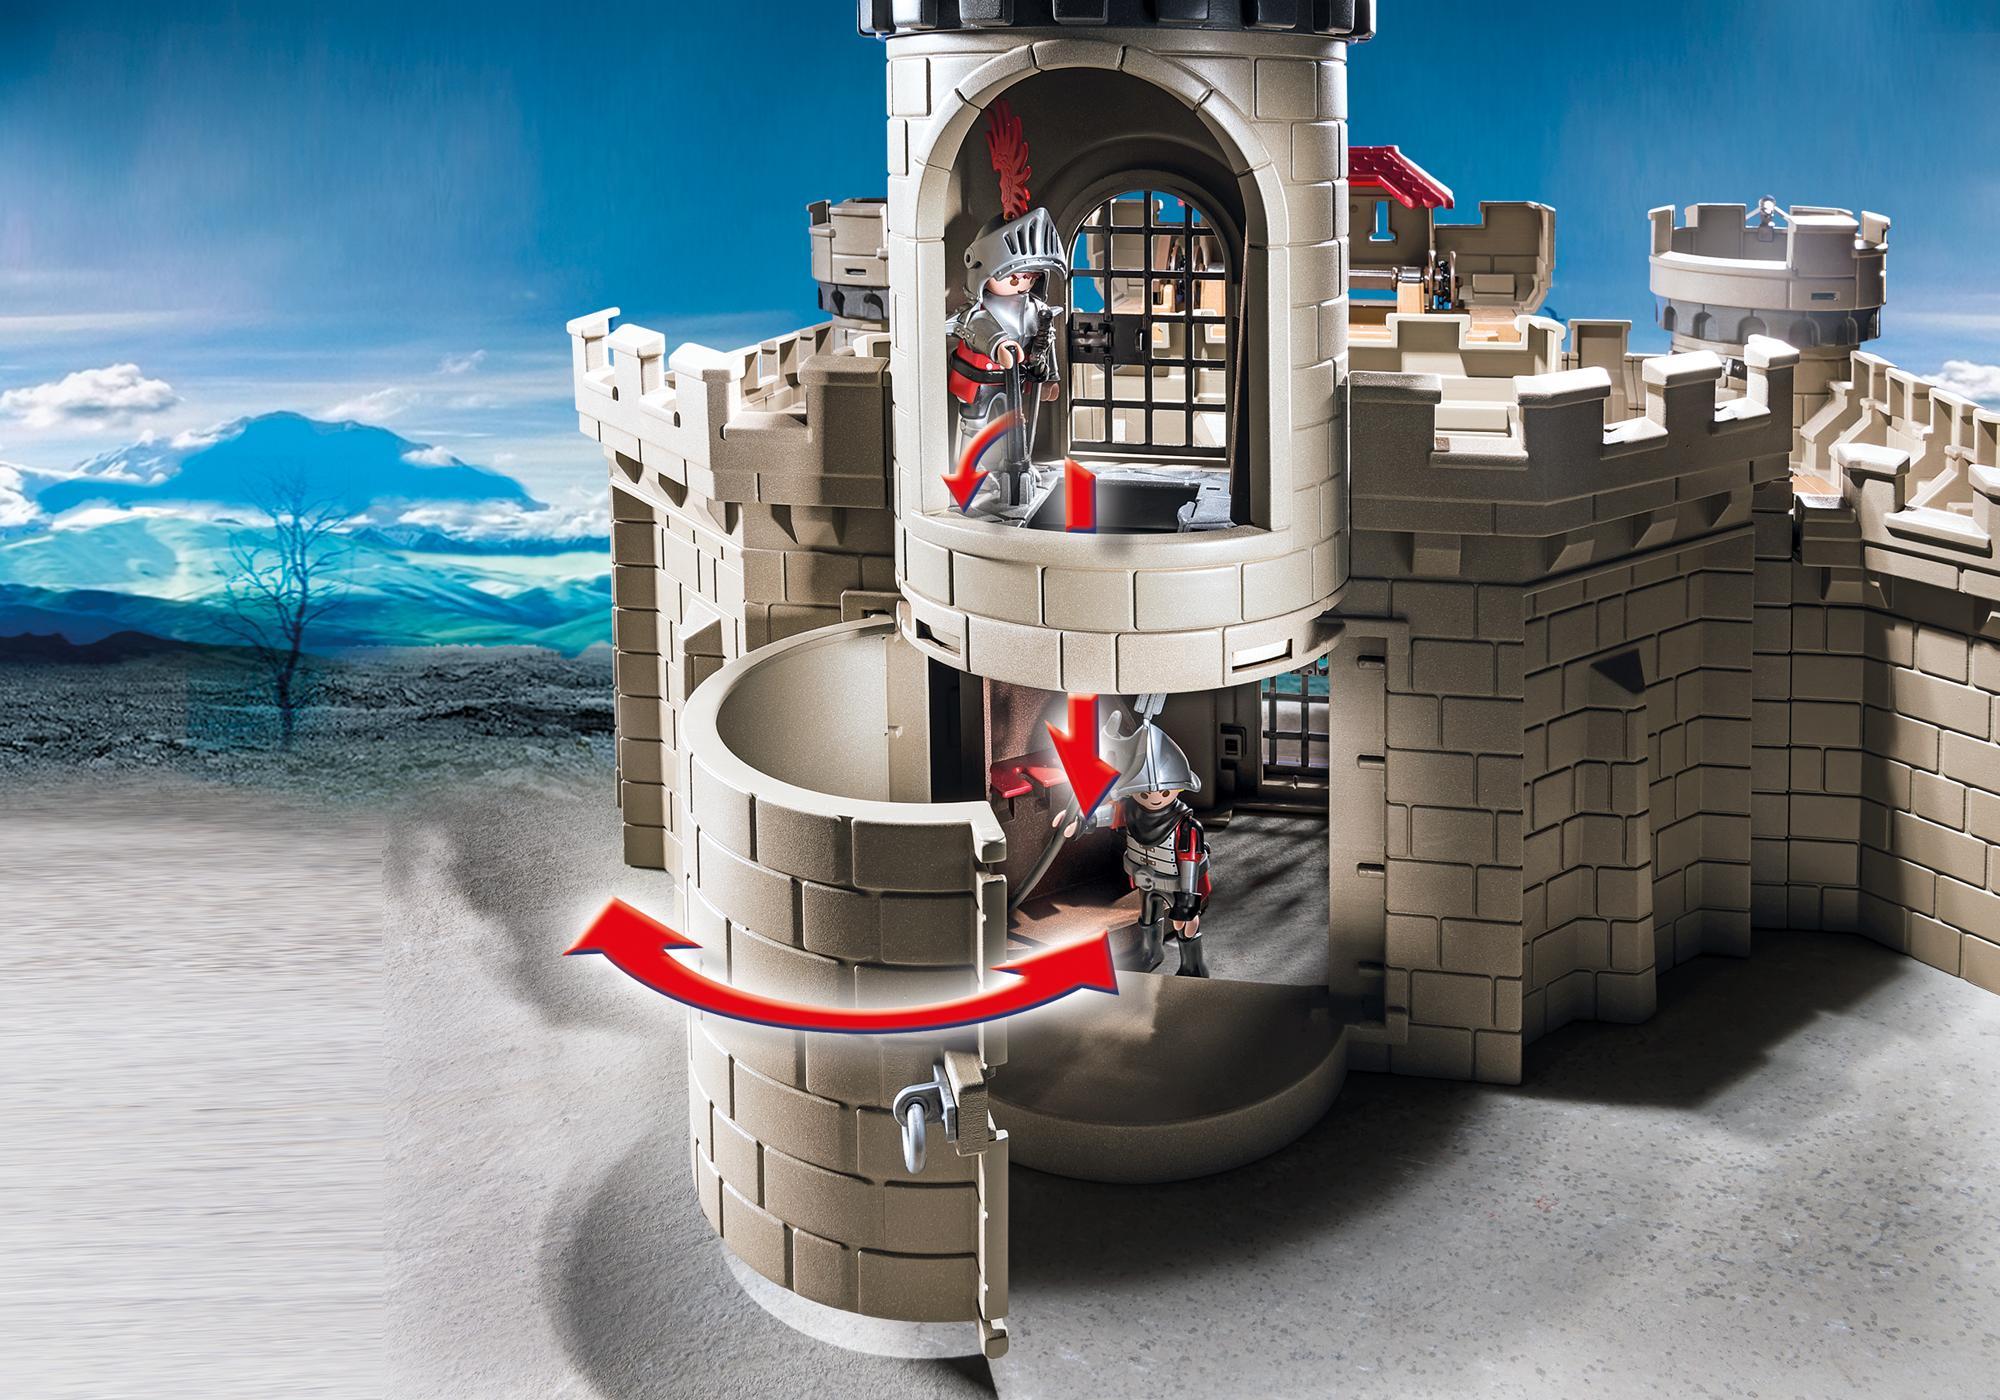 http://media.playmobil.com/i/playmobil/6001_product_extra3/Hawk Knights` Castle